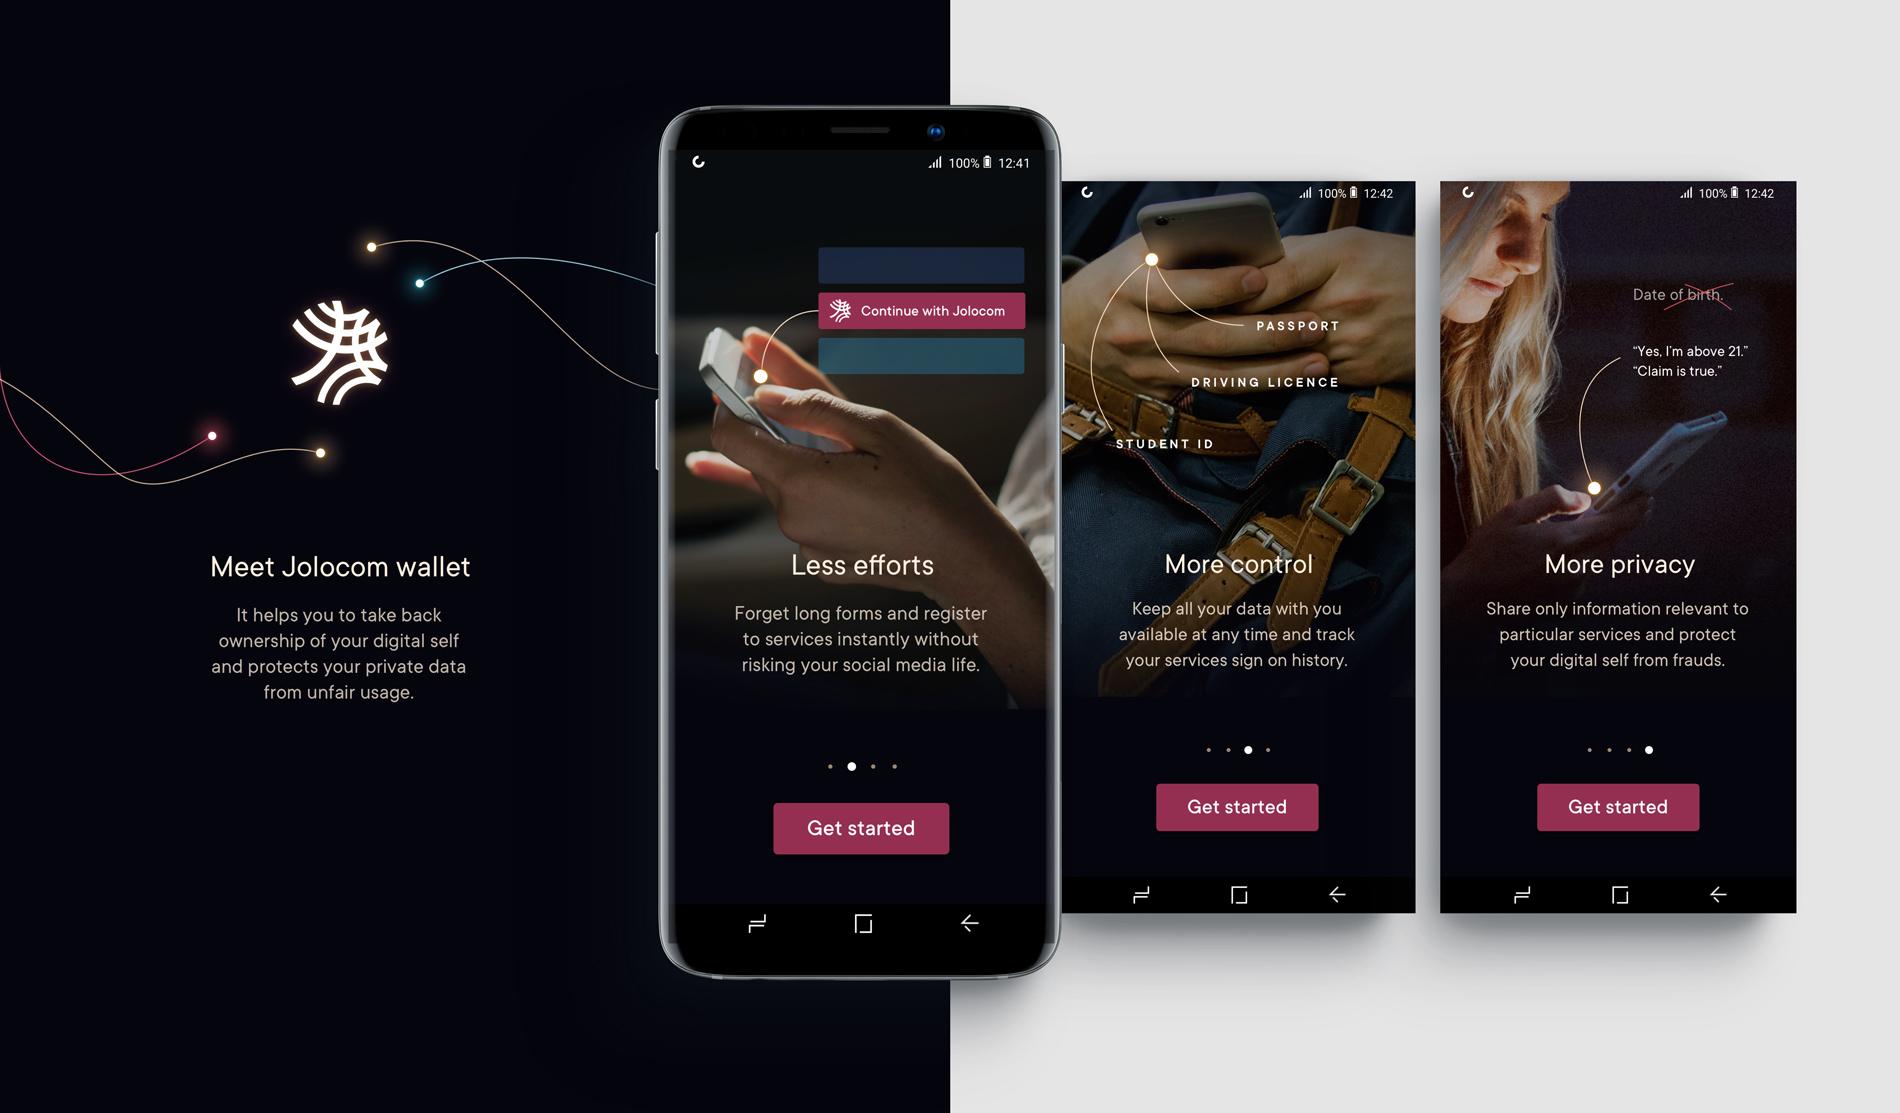 Jolocom android update nezhynska hd